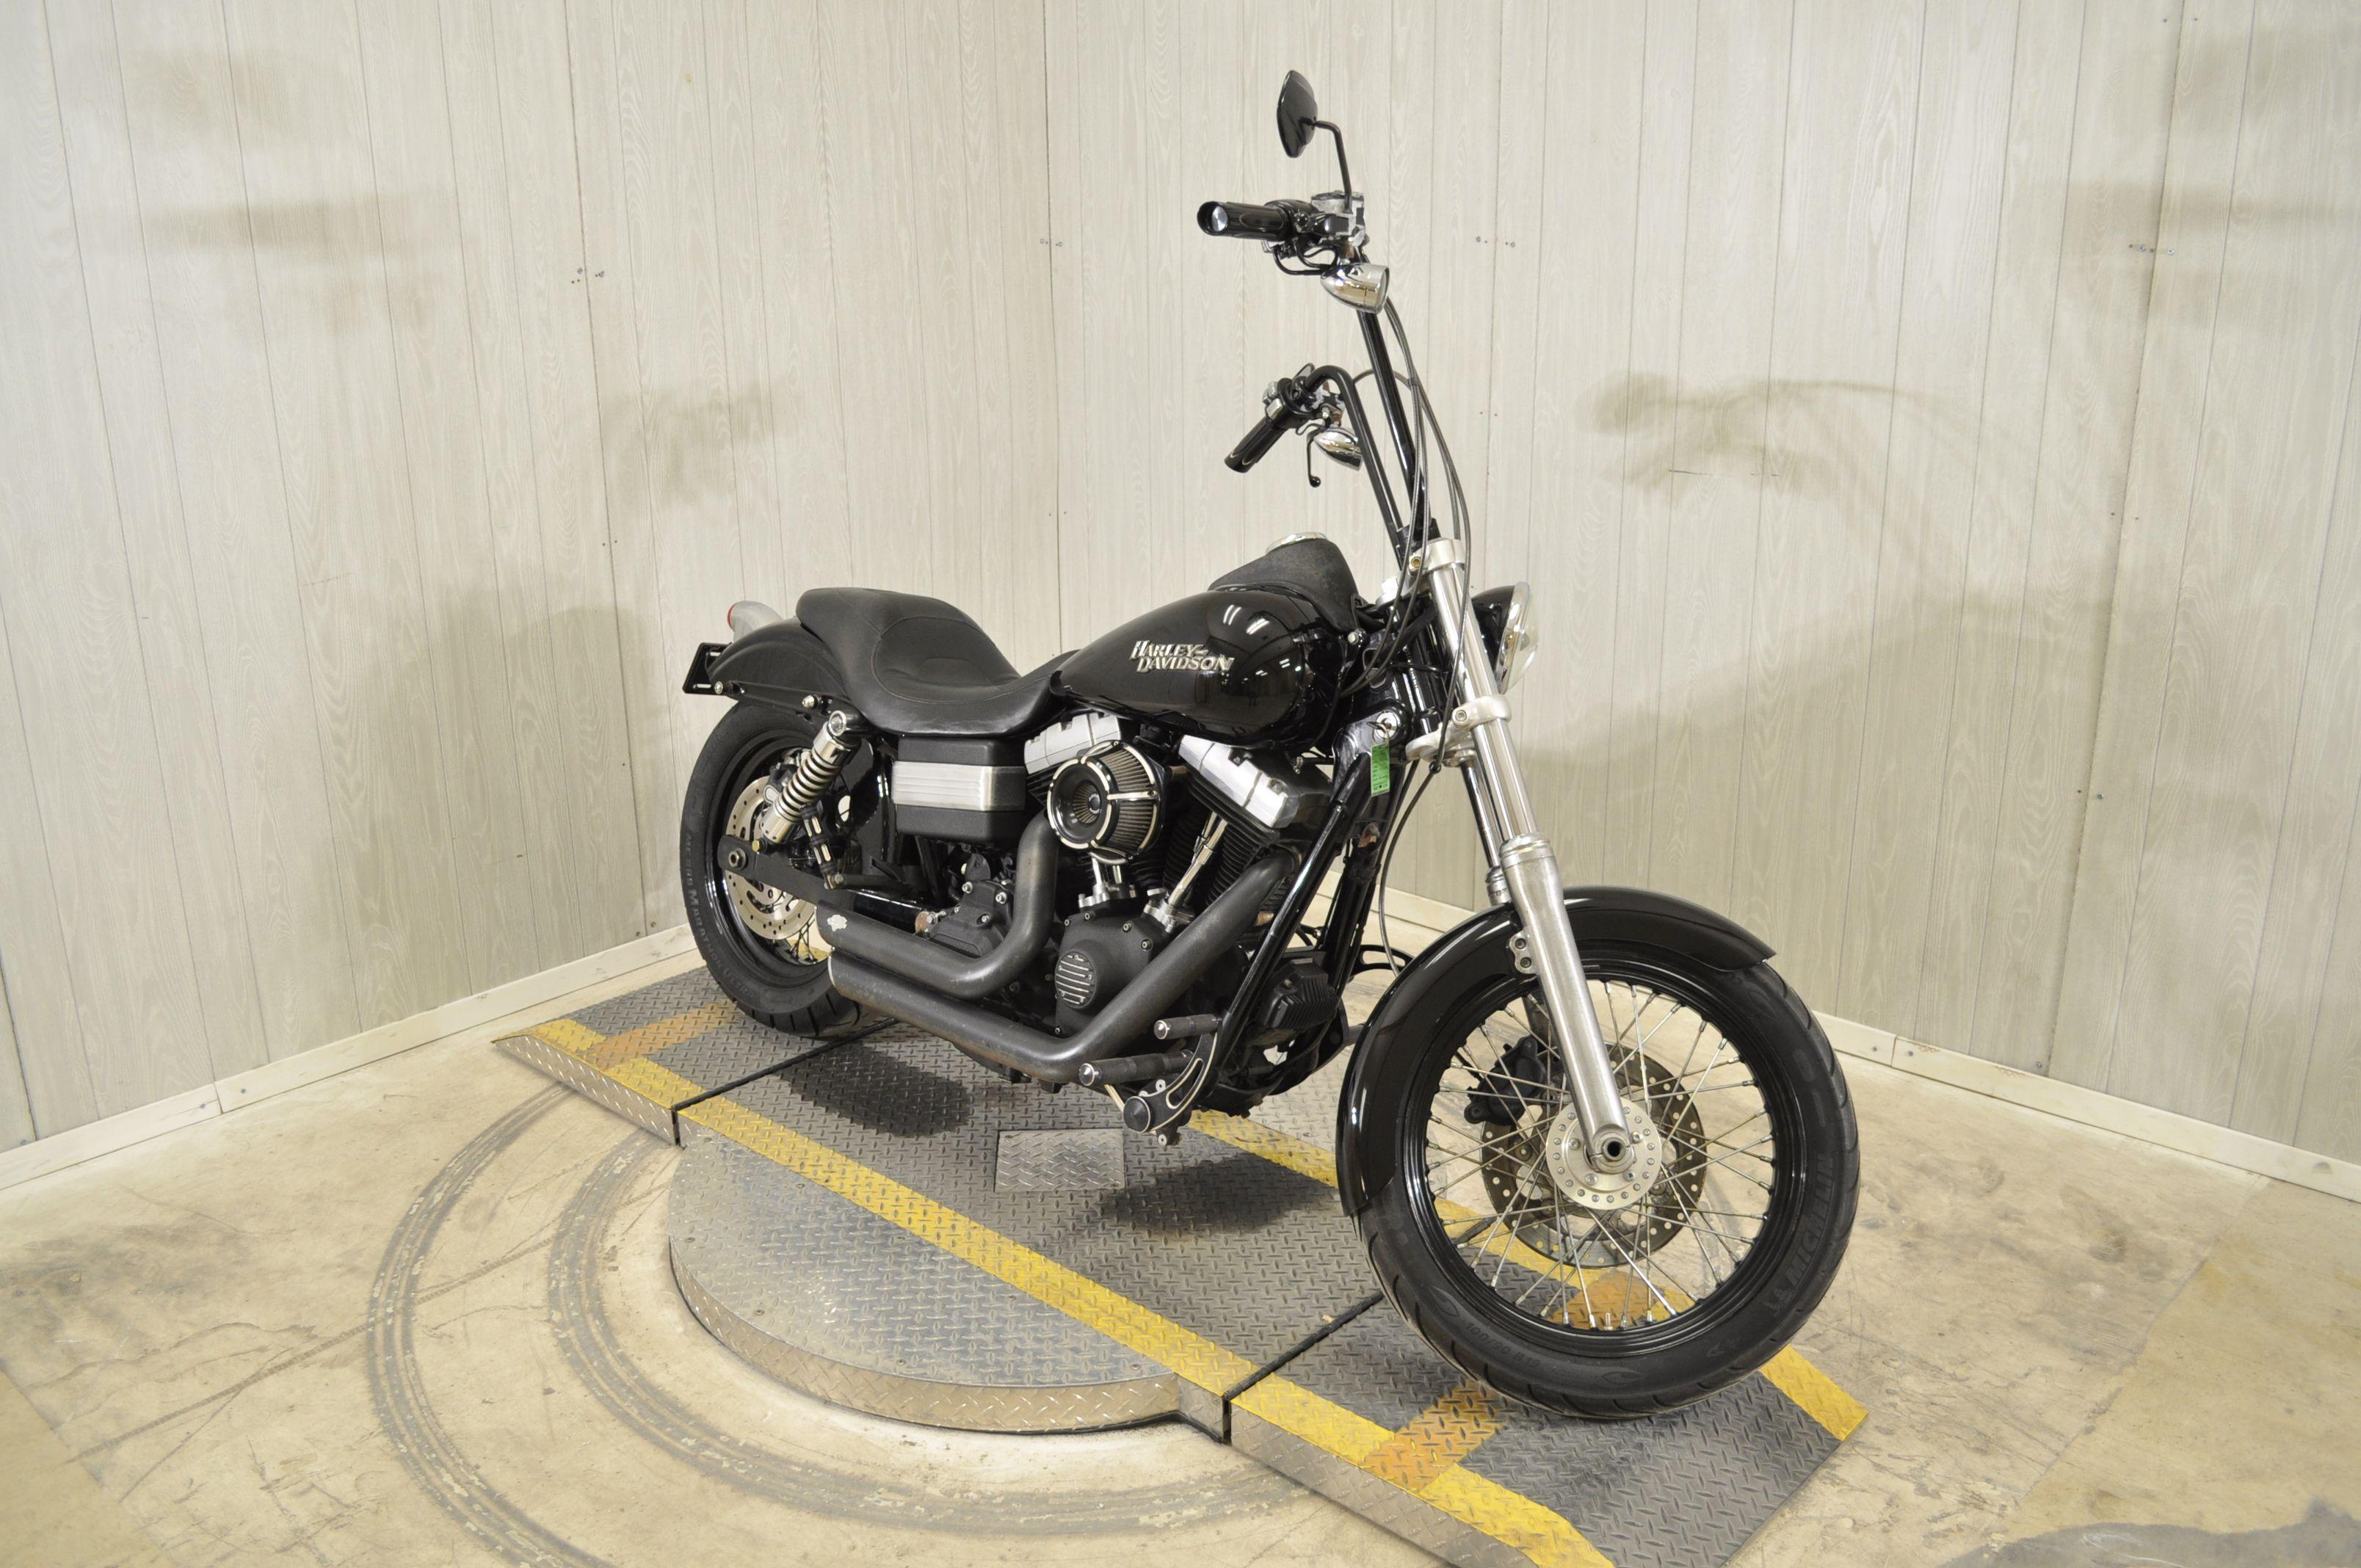 Pre-Owned 2011 Harley-Davidson Street Bob FXDB